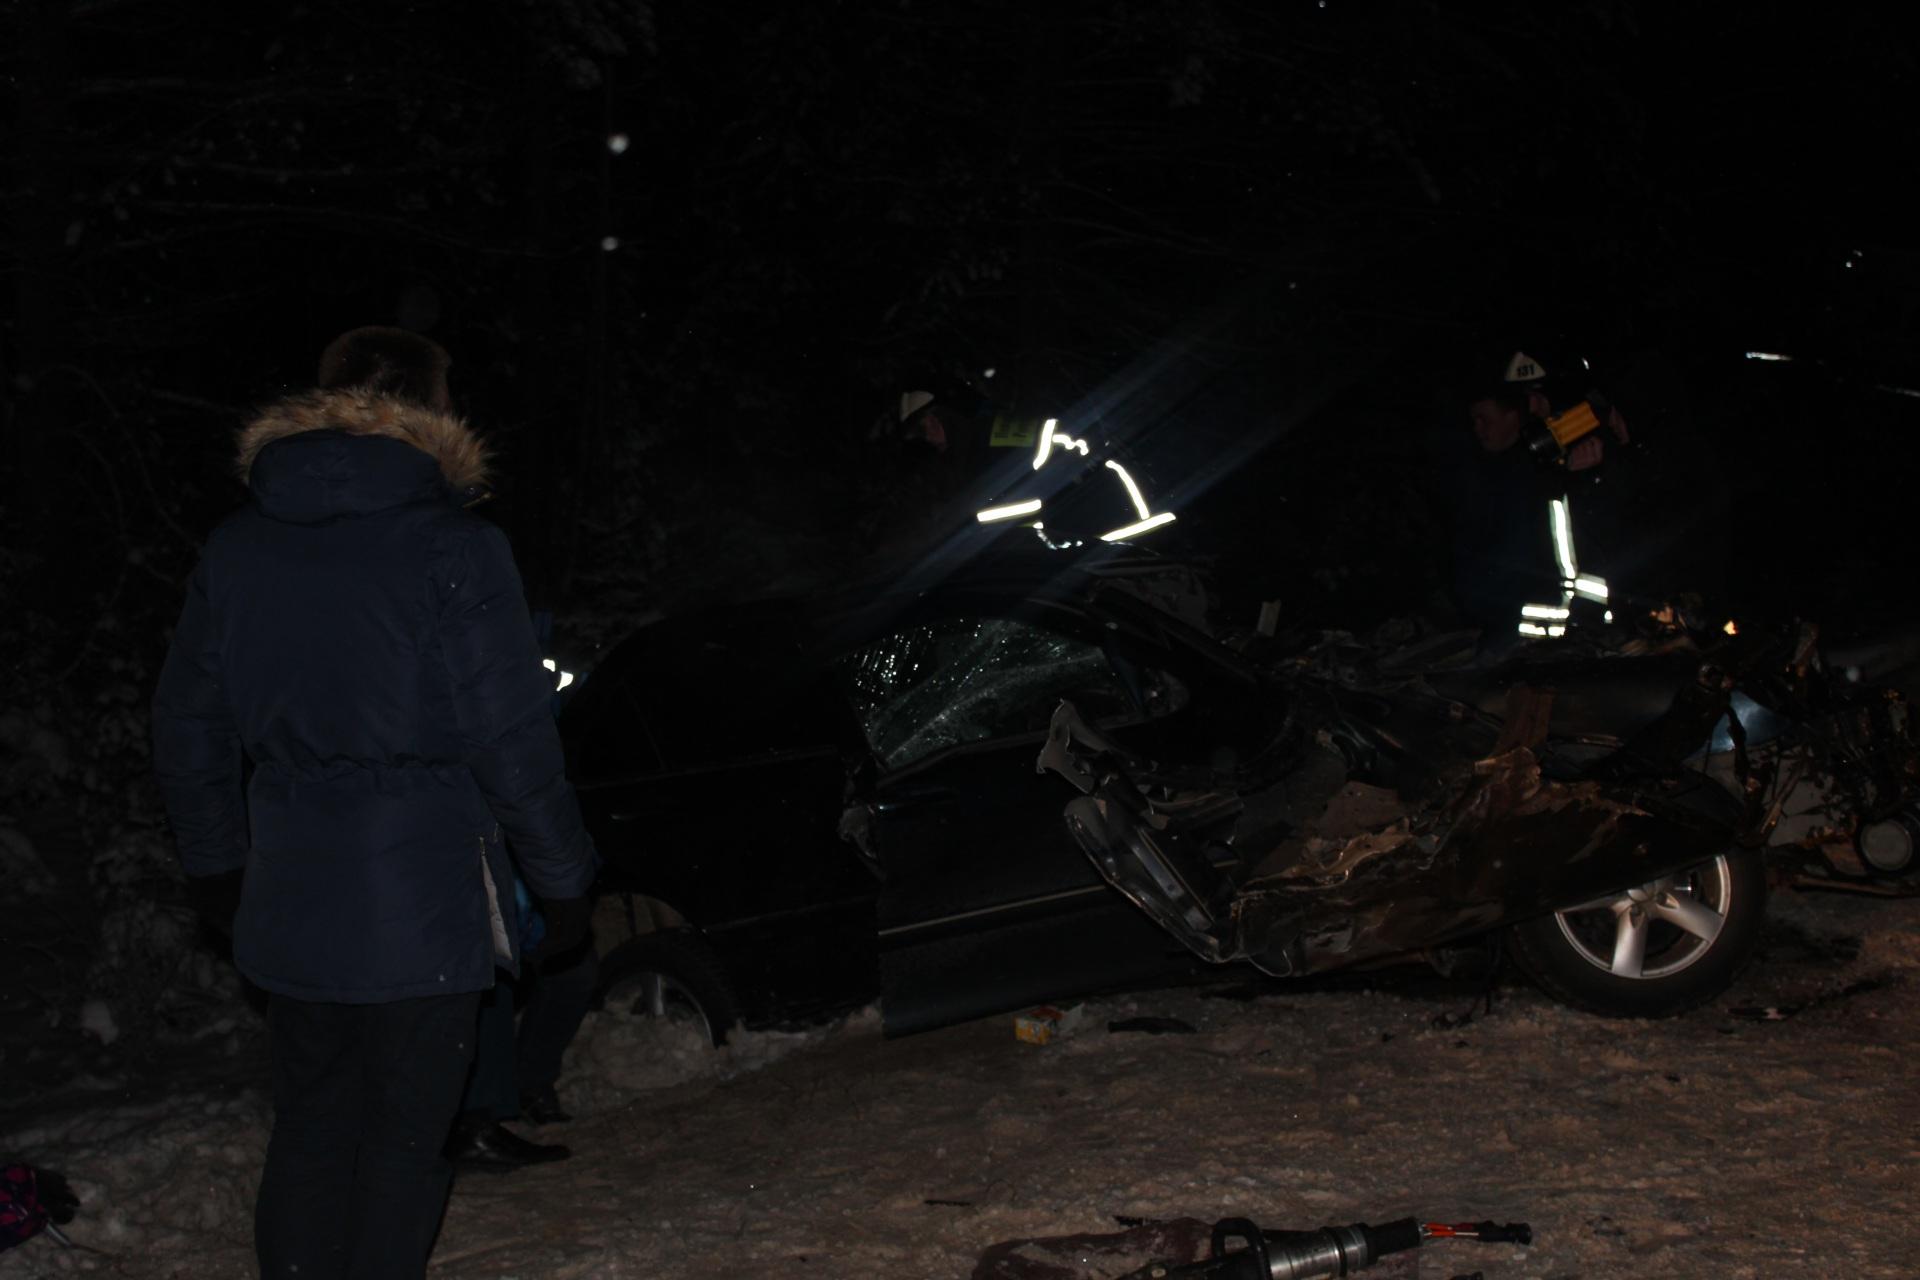 В итоге ДТП вреспублике Коми погибло 2 человека